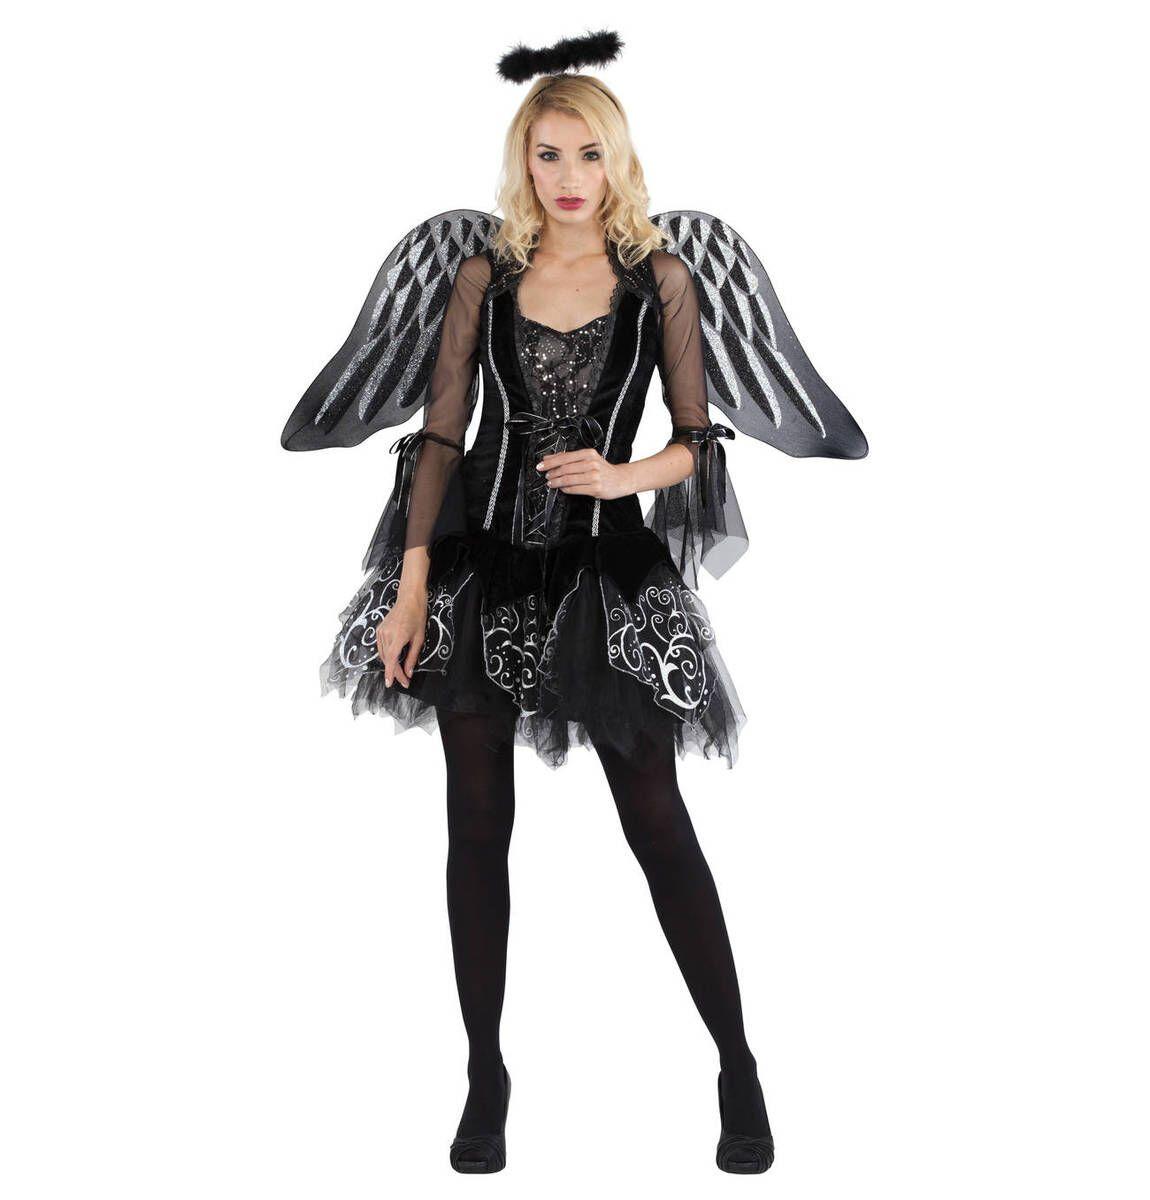 Halloween Kostueme Karstadt.Fallen Angel Mit Flugeln 40crazy Days Fallen Angel Mit Flugeln Karnevalskostume Damen Karneval Kostum Damen Kostumvorschlage